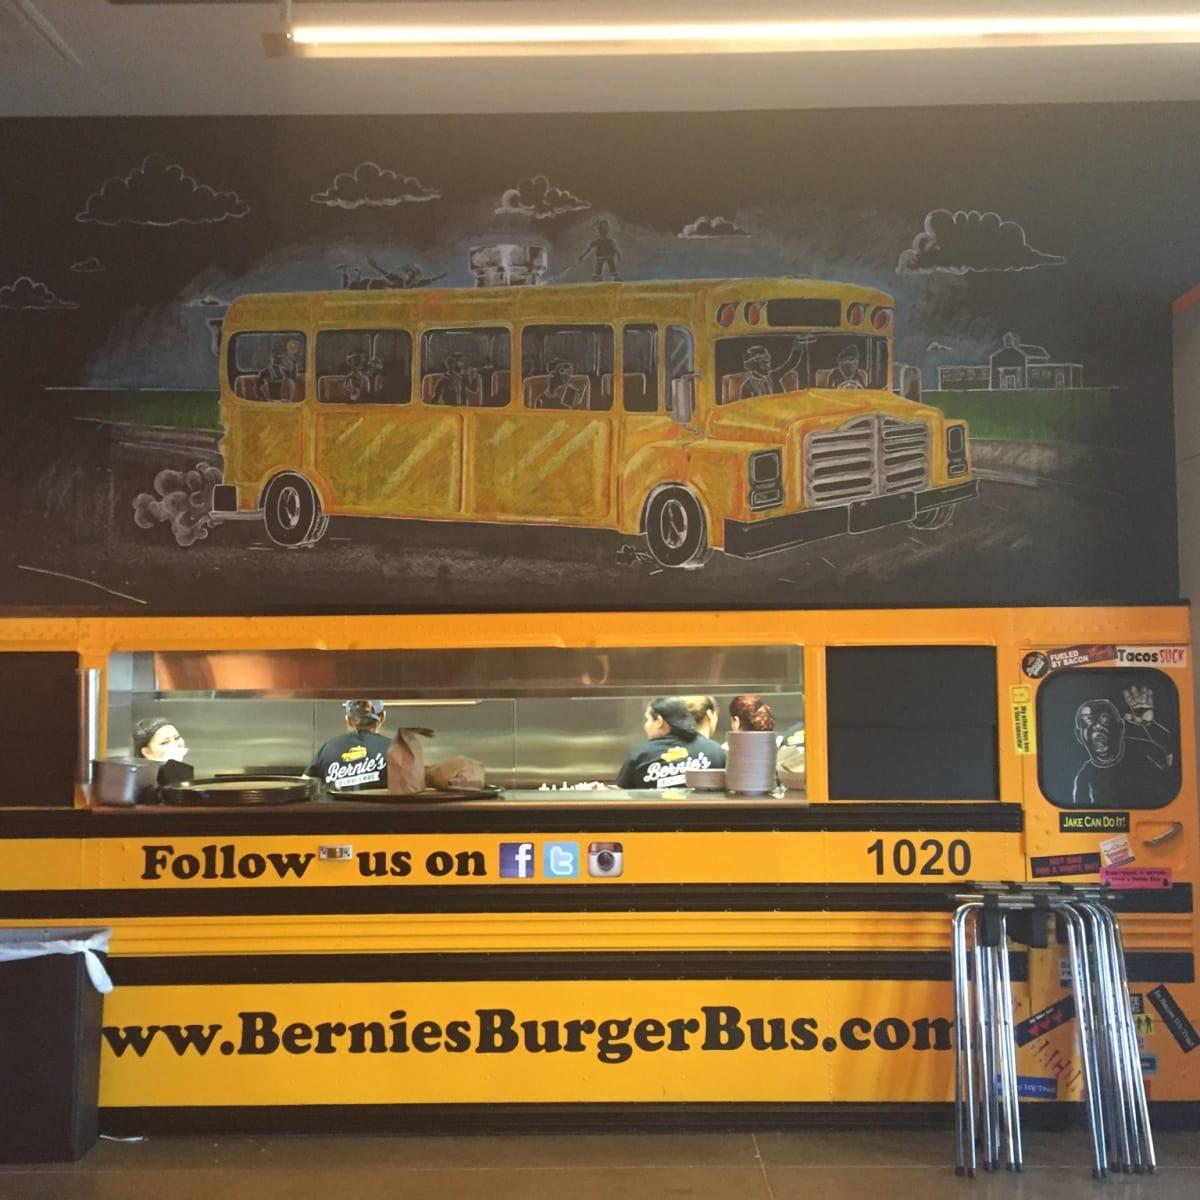 Bernie's Burger Bus Katy